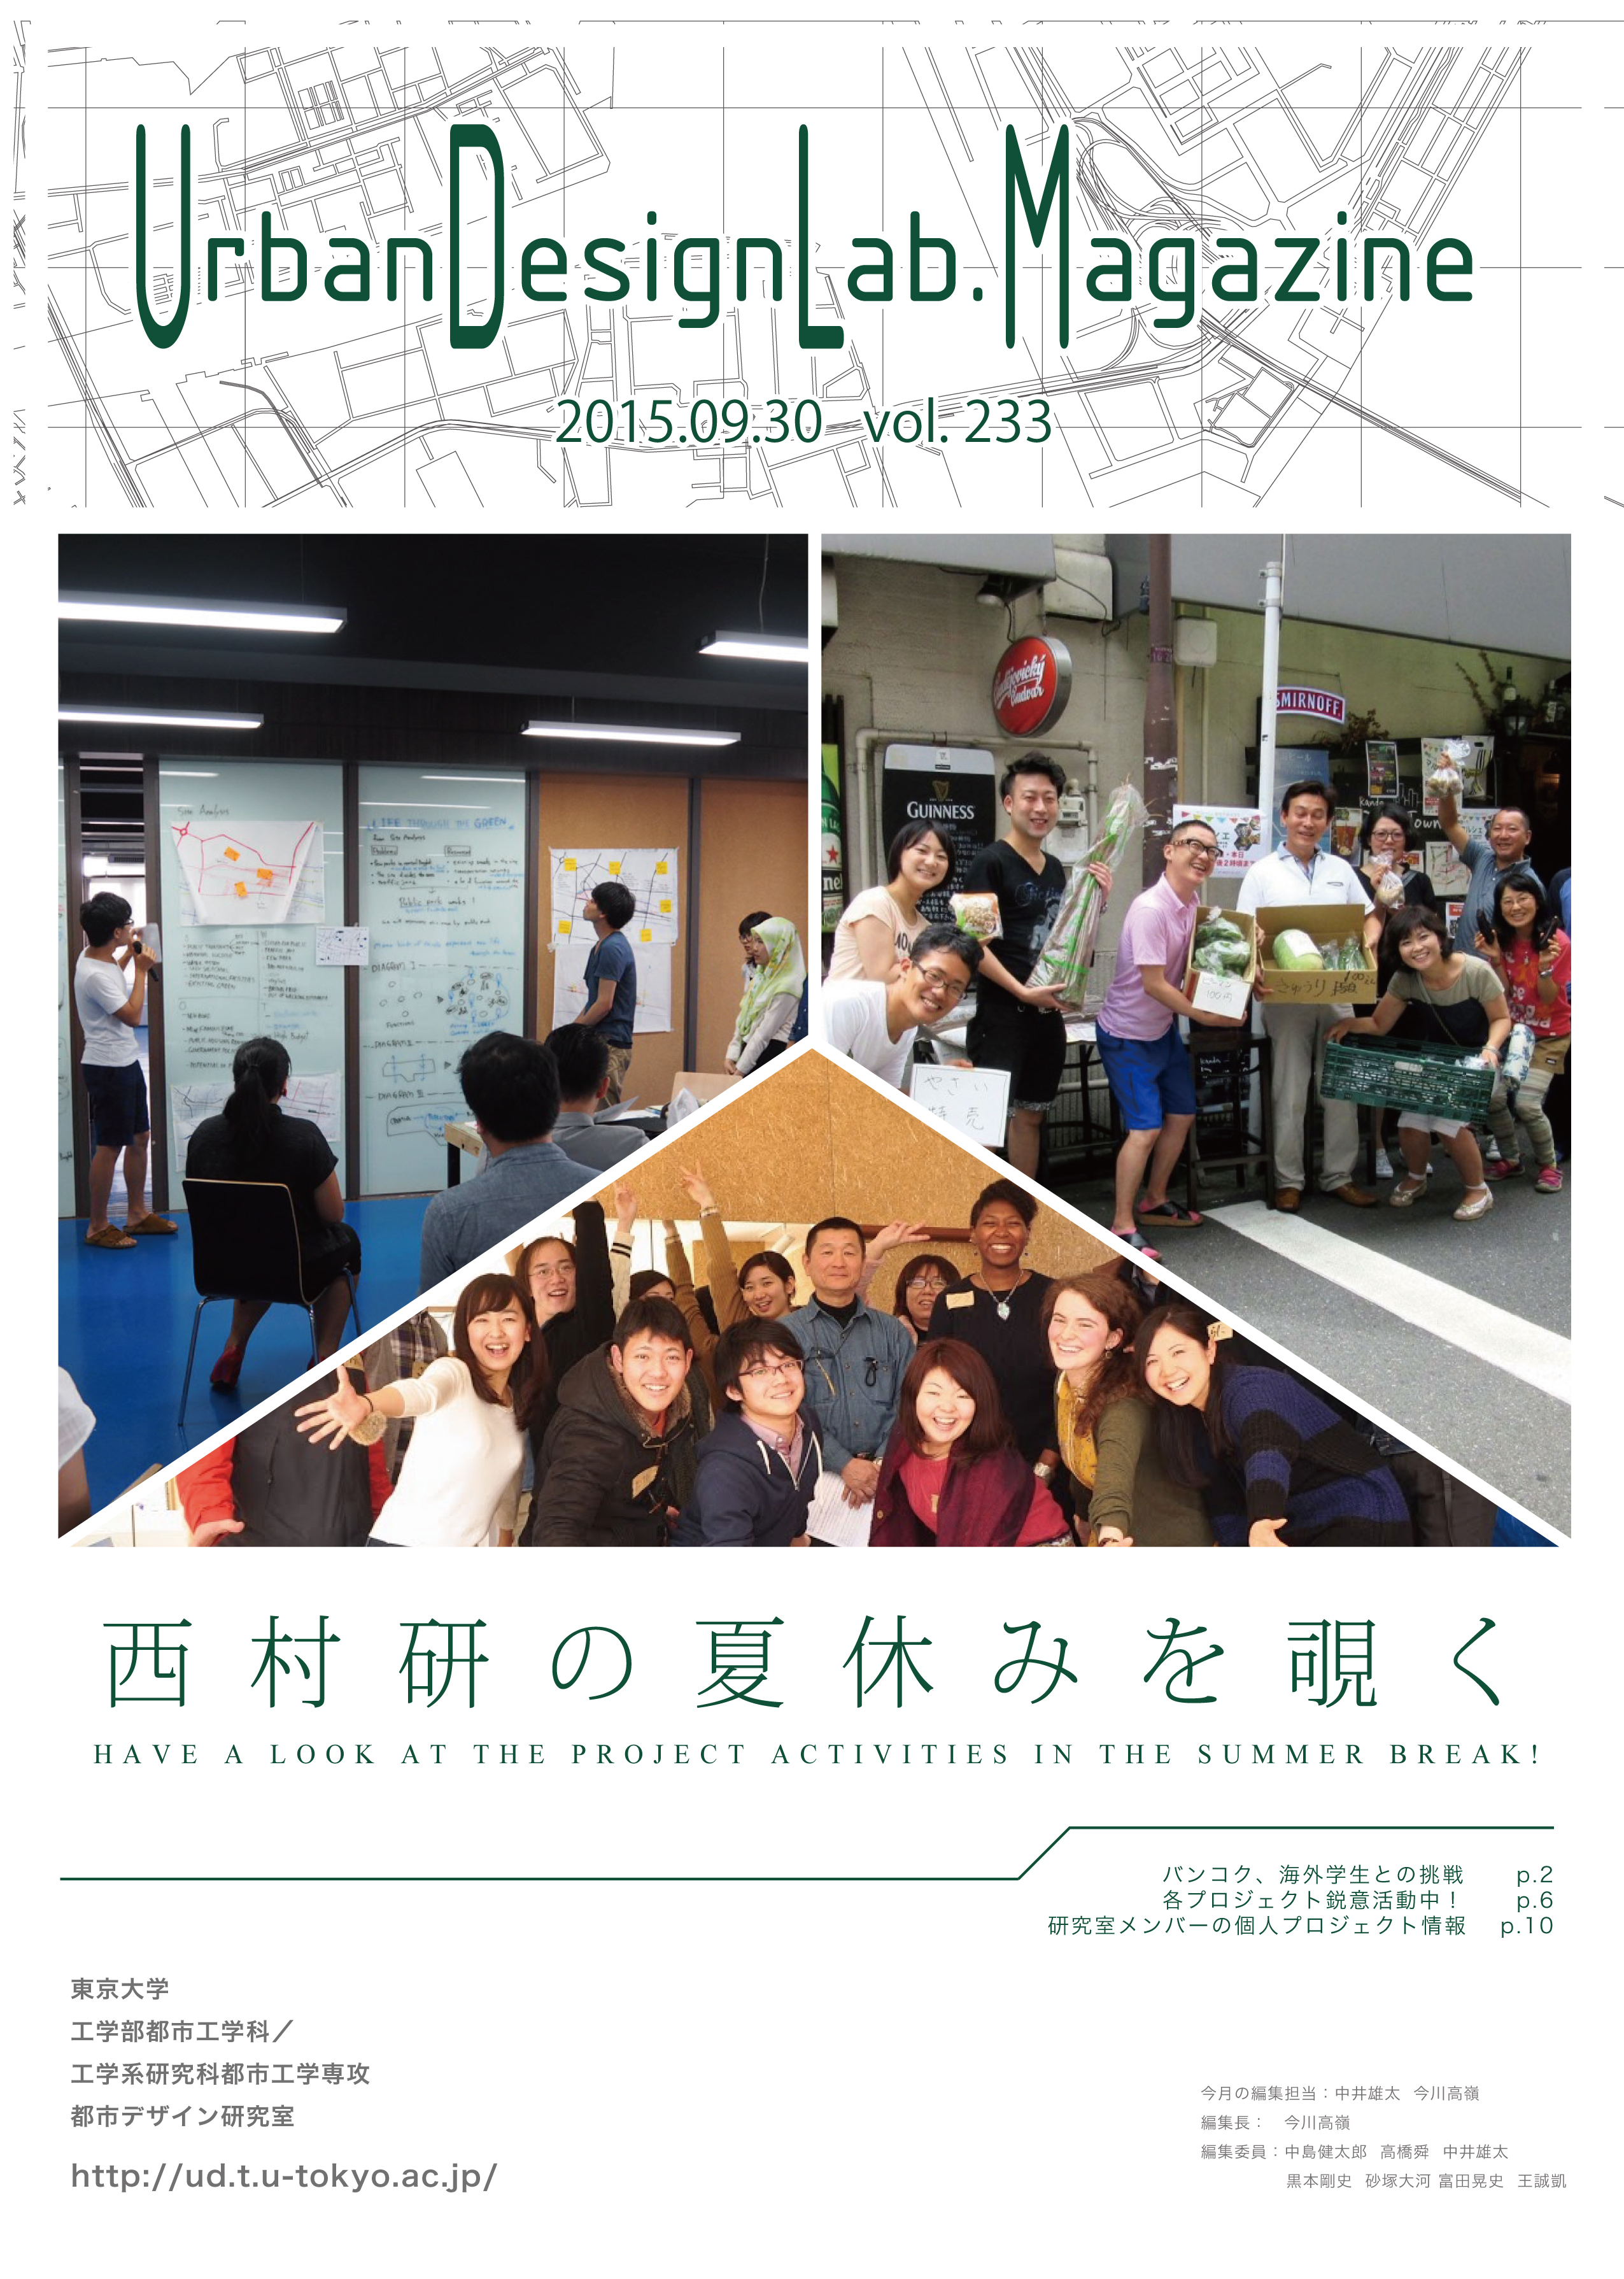 http://ud.t.u-tokyo.ac.jp/blog/_images/233%E5%8F%B7%E8%A1%A8%E7%B4%99-01.jpg